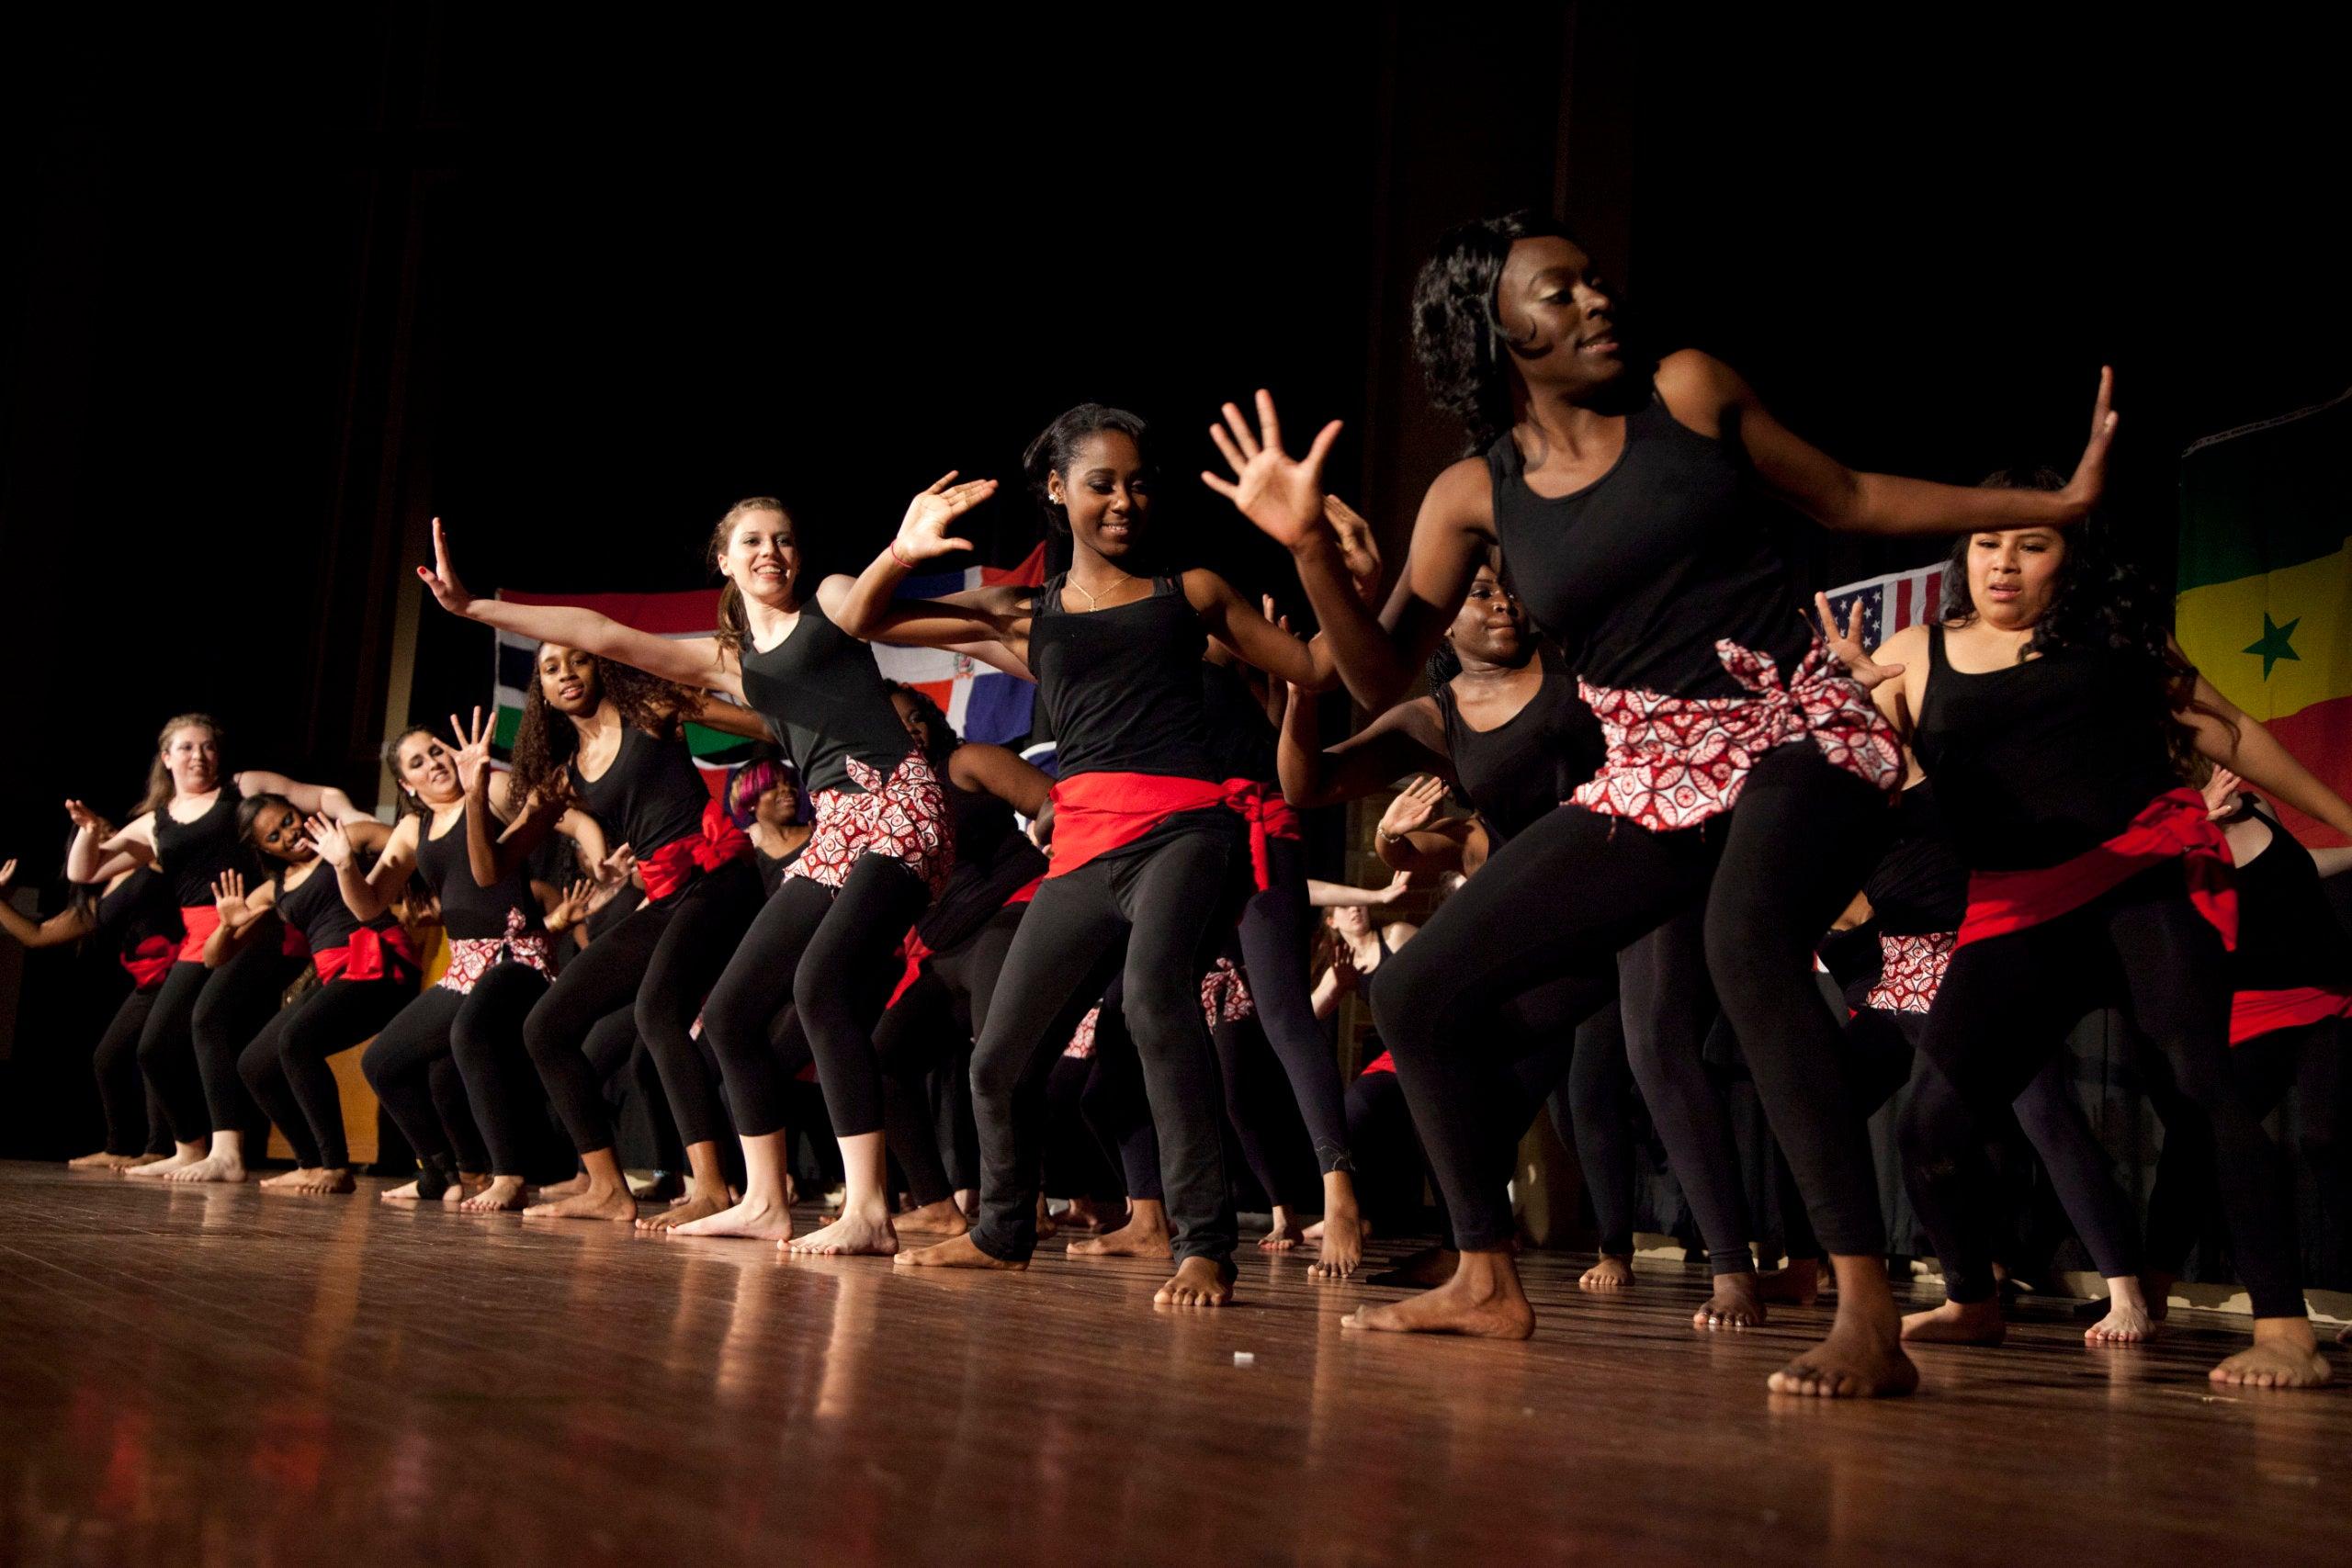 members of the Alima Dance Company